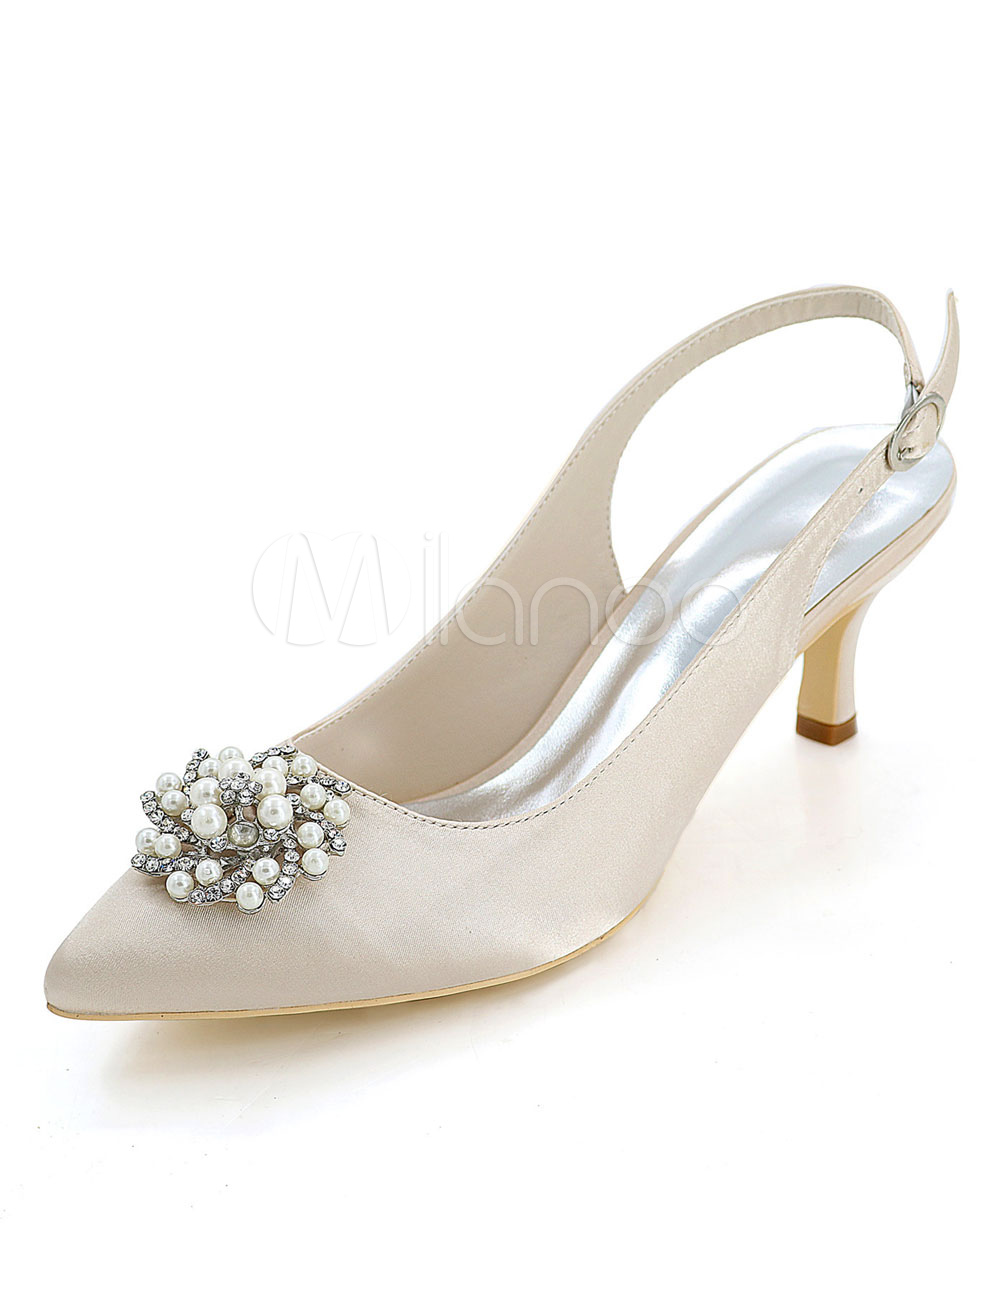 Champagne Wedding Shoes Pointed Toe Kitten Heel Rhinestones Pearls Slingbacks Bridal Pumps